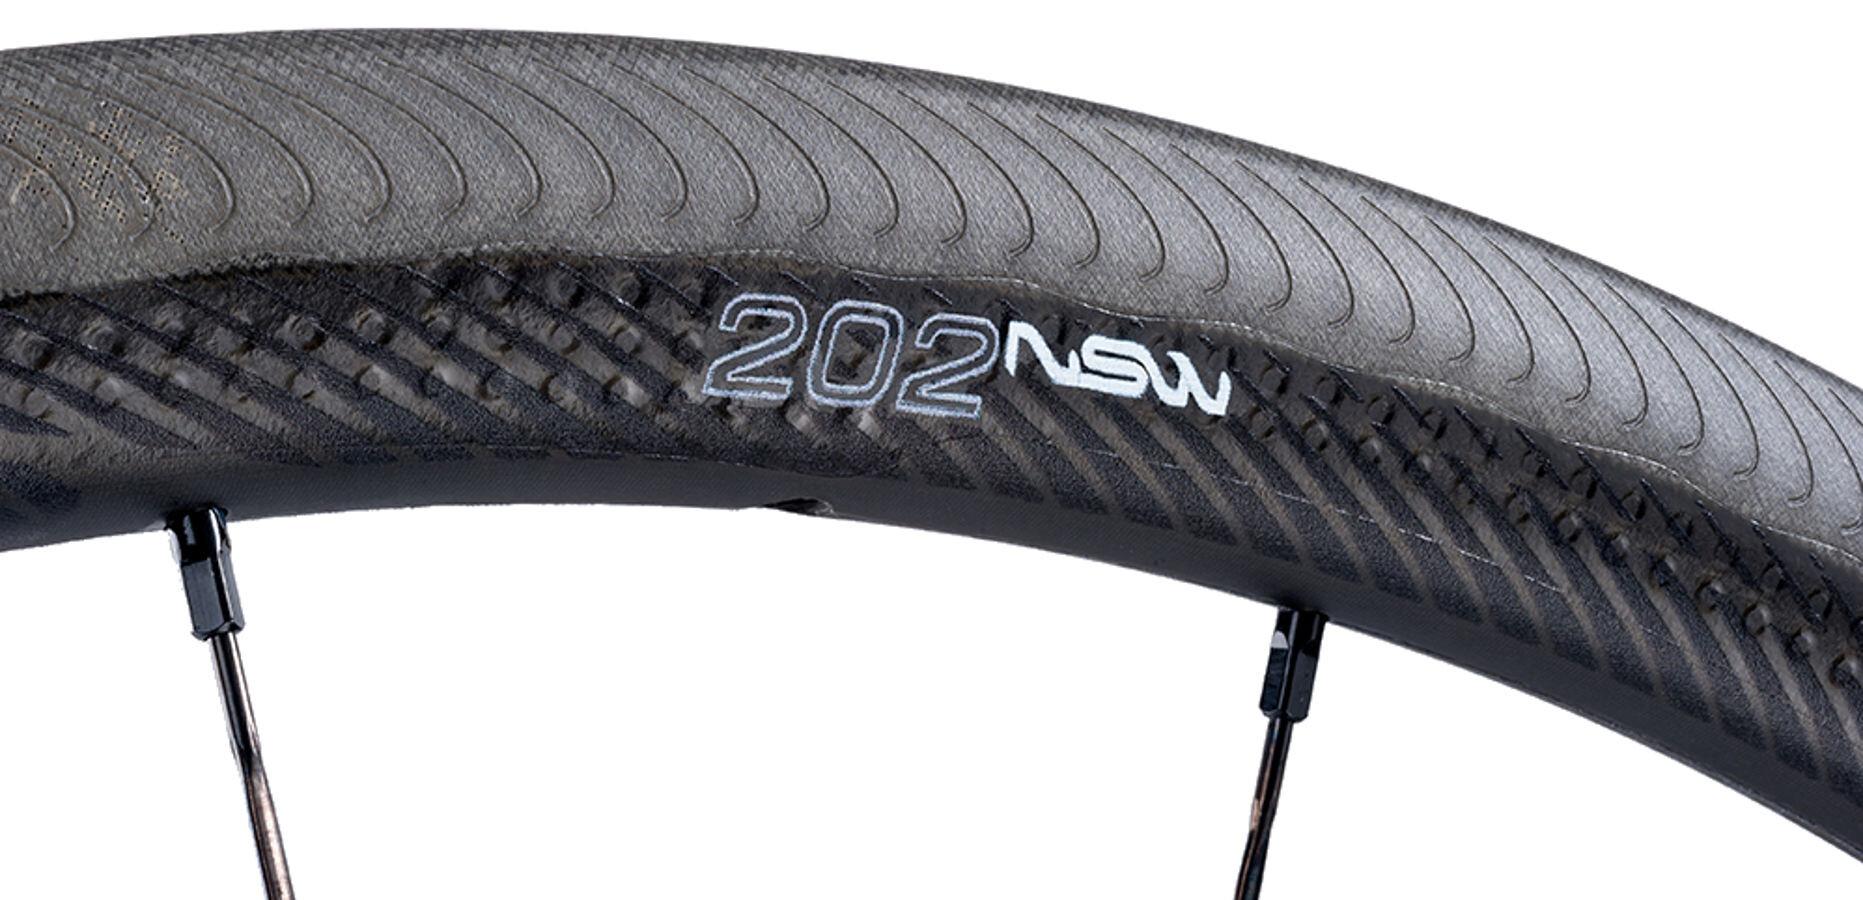 Zipp 202 NSW Hinterrad Clincher SRAMShimano